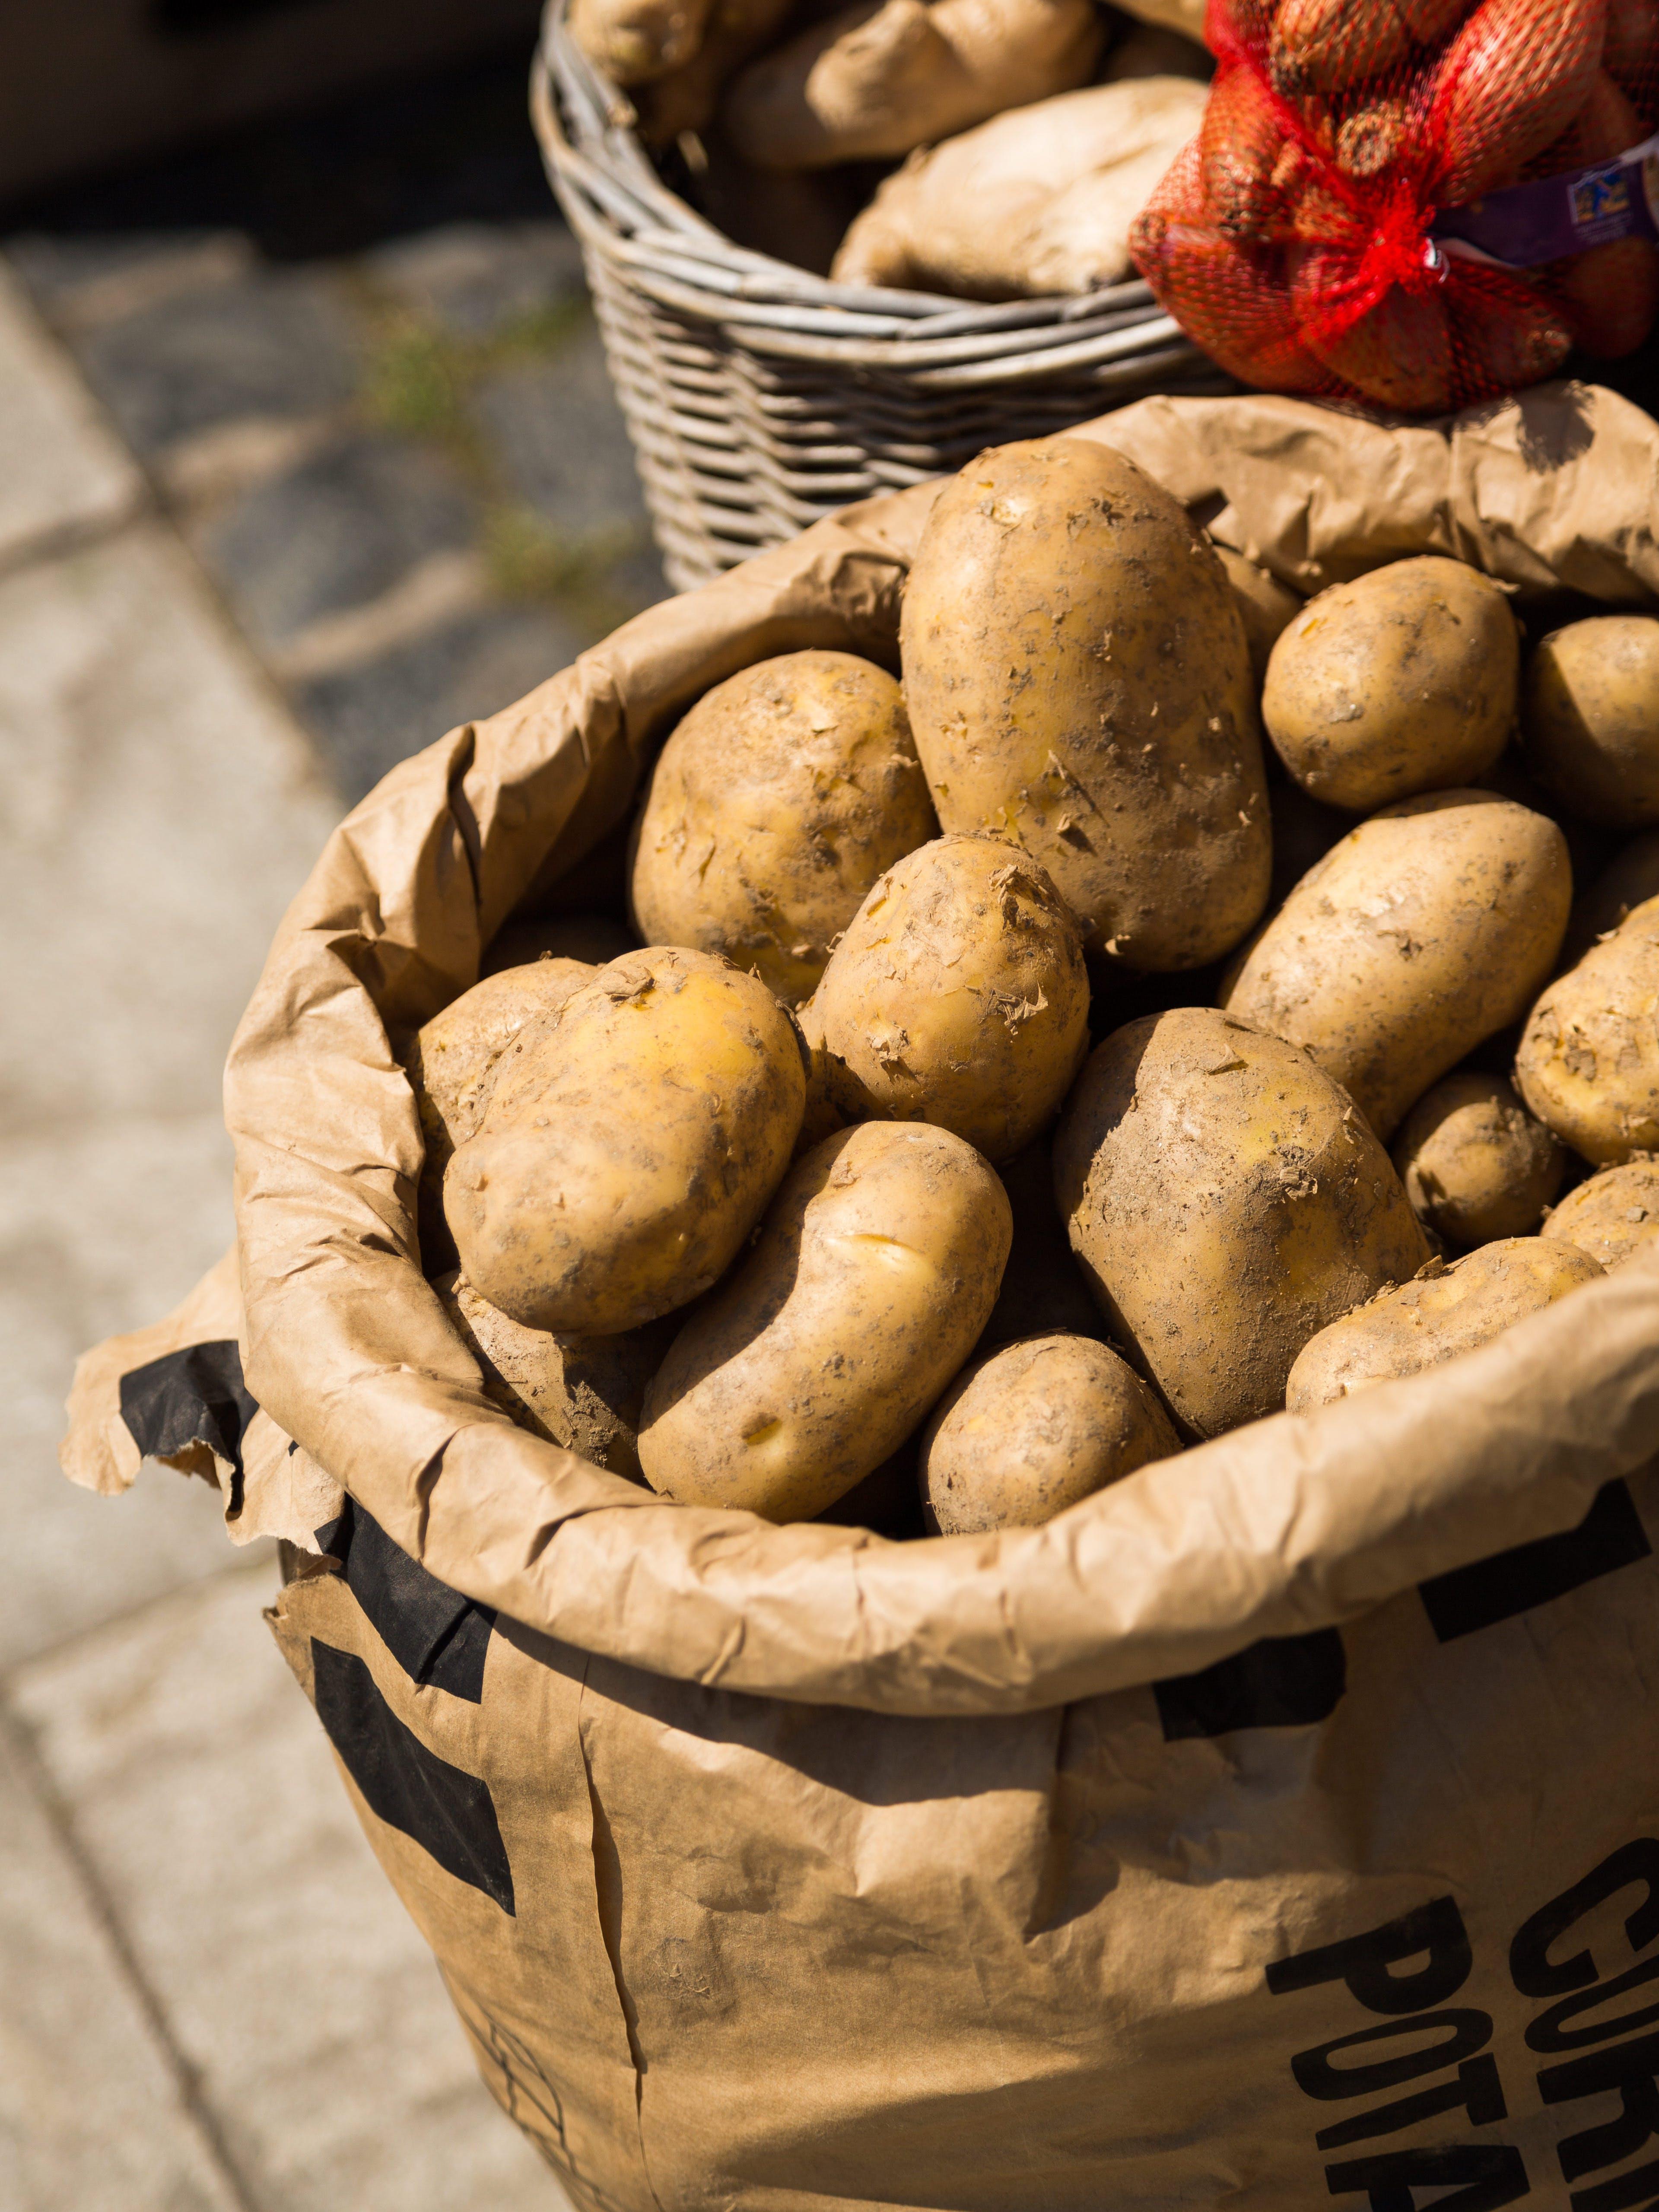 Free stock photo of food, greengrocer, potatoes, sack